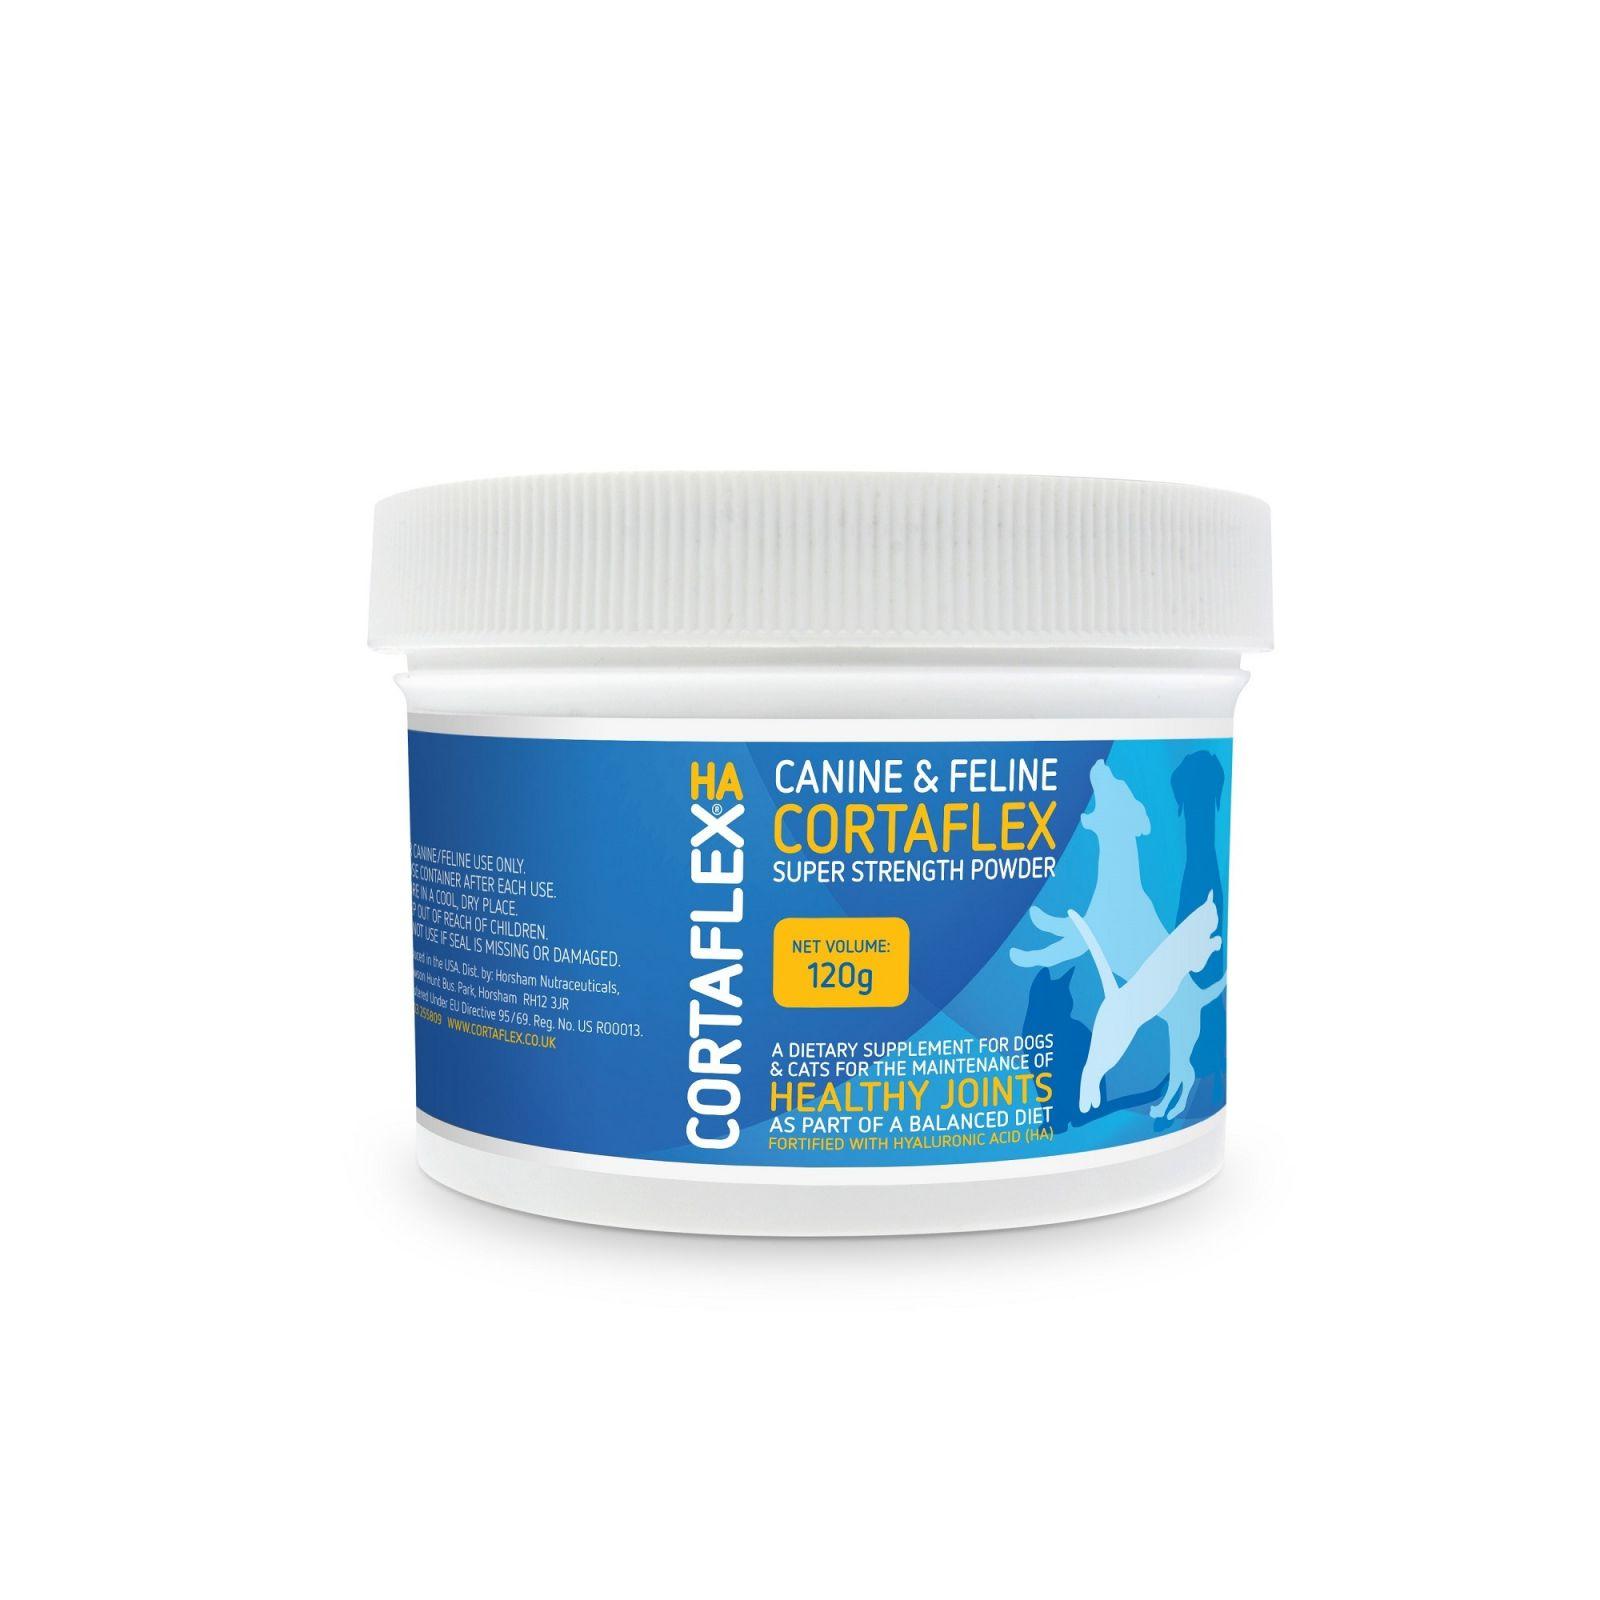 CANINE & FELINE CORTAFLEX® HA POWDER